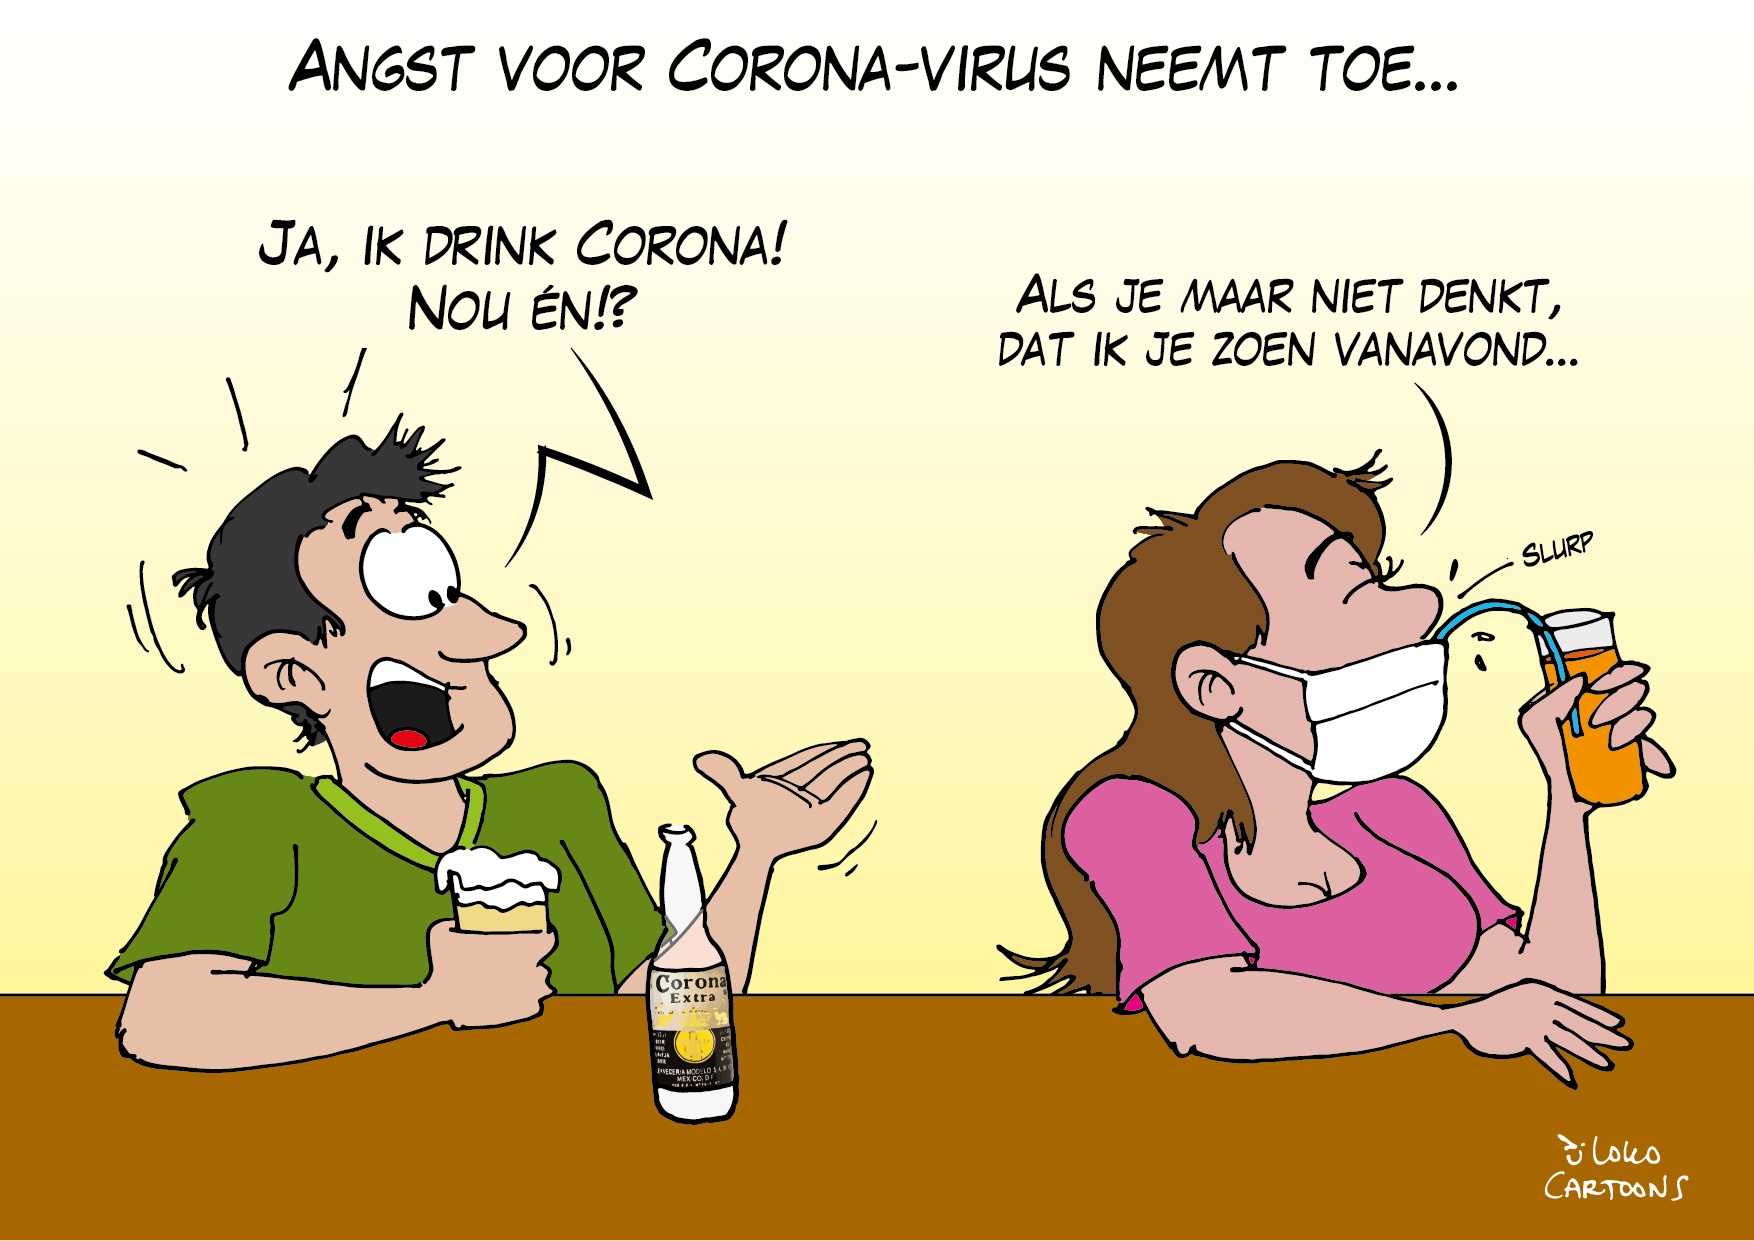 Angst voor Coronavirus neemt toe…